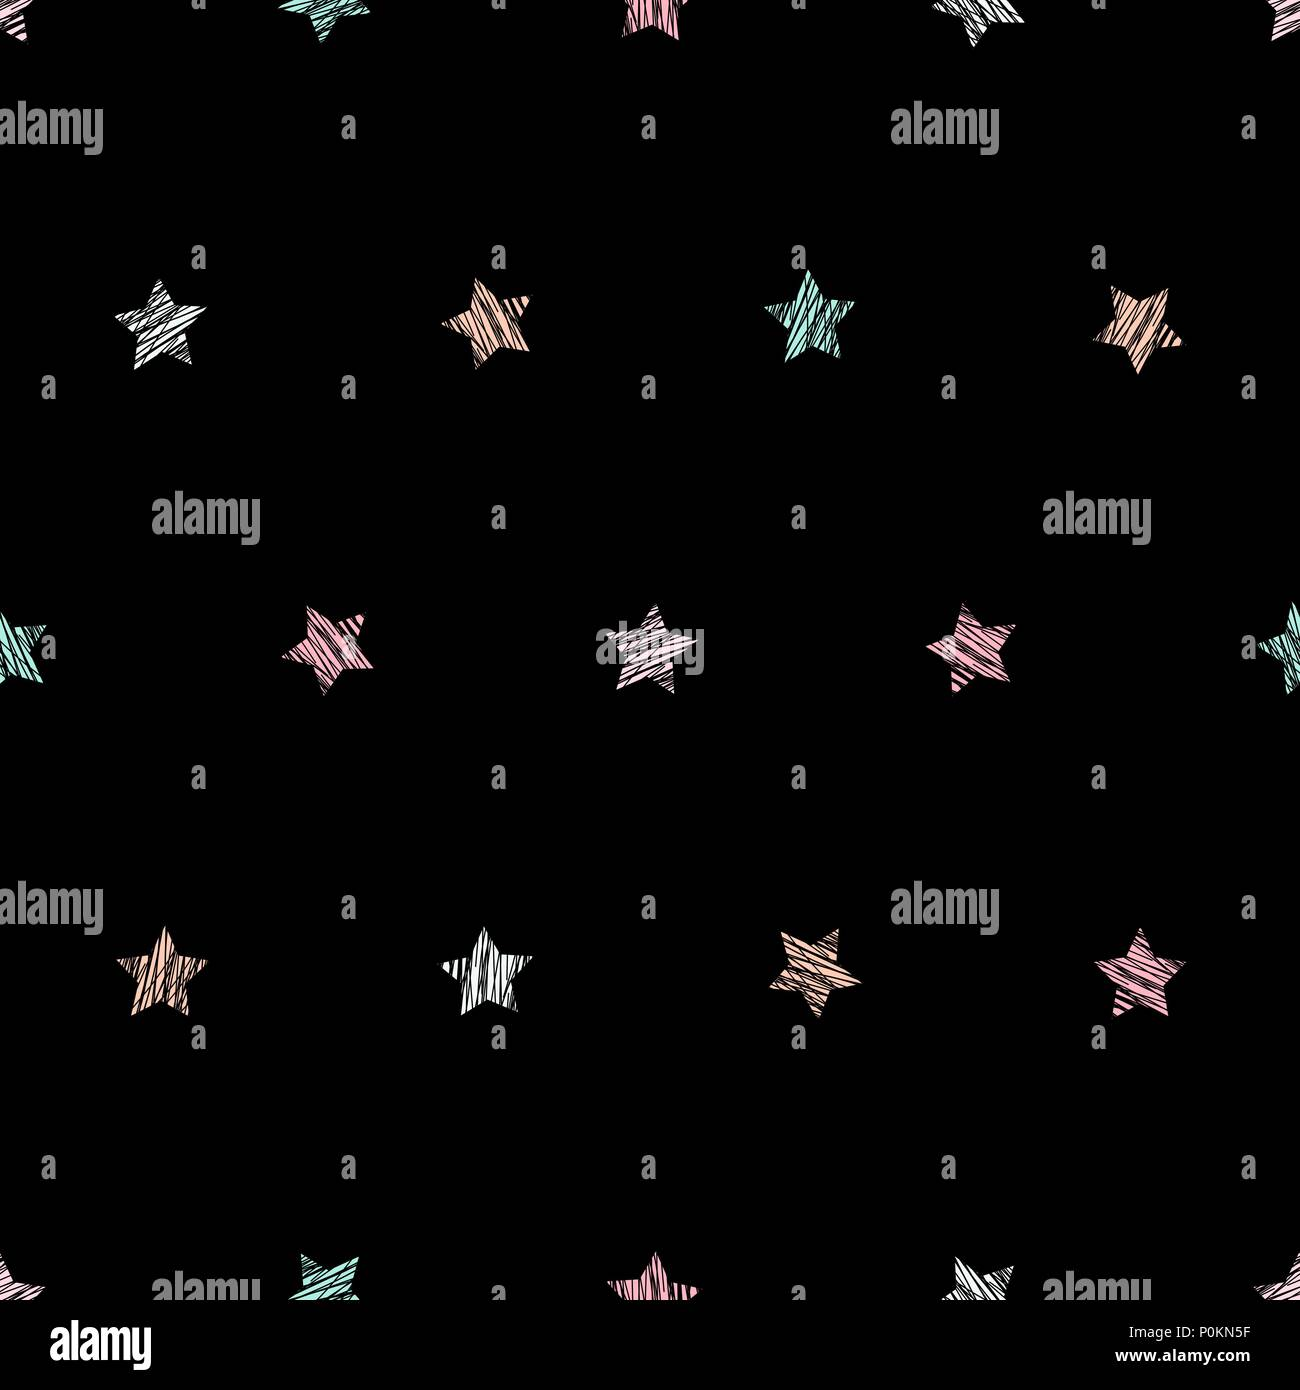 Star Texture Plain Seamless Pattern Black Background Pale Pink